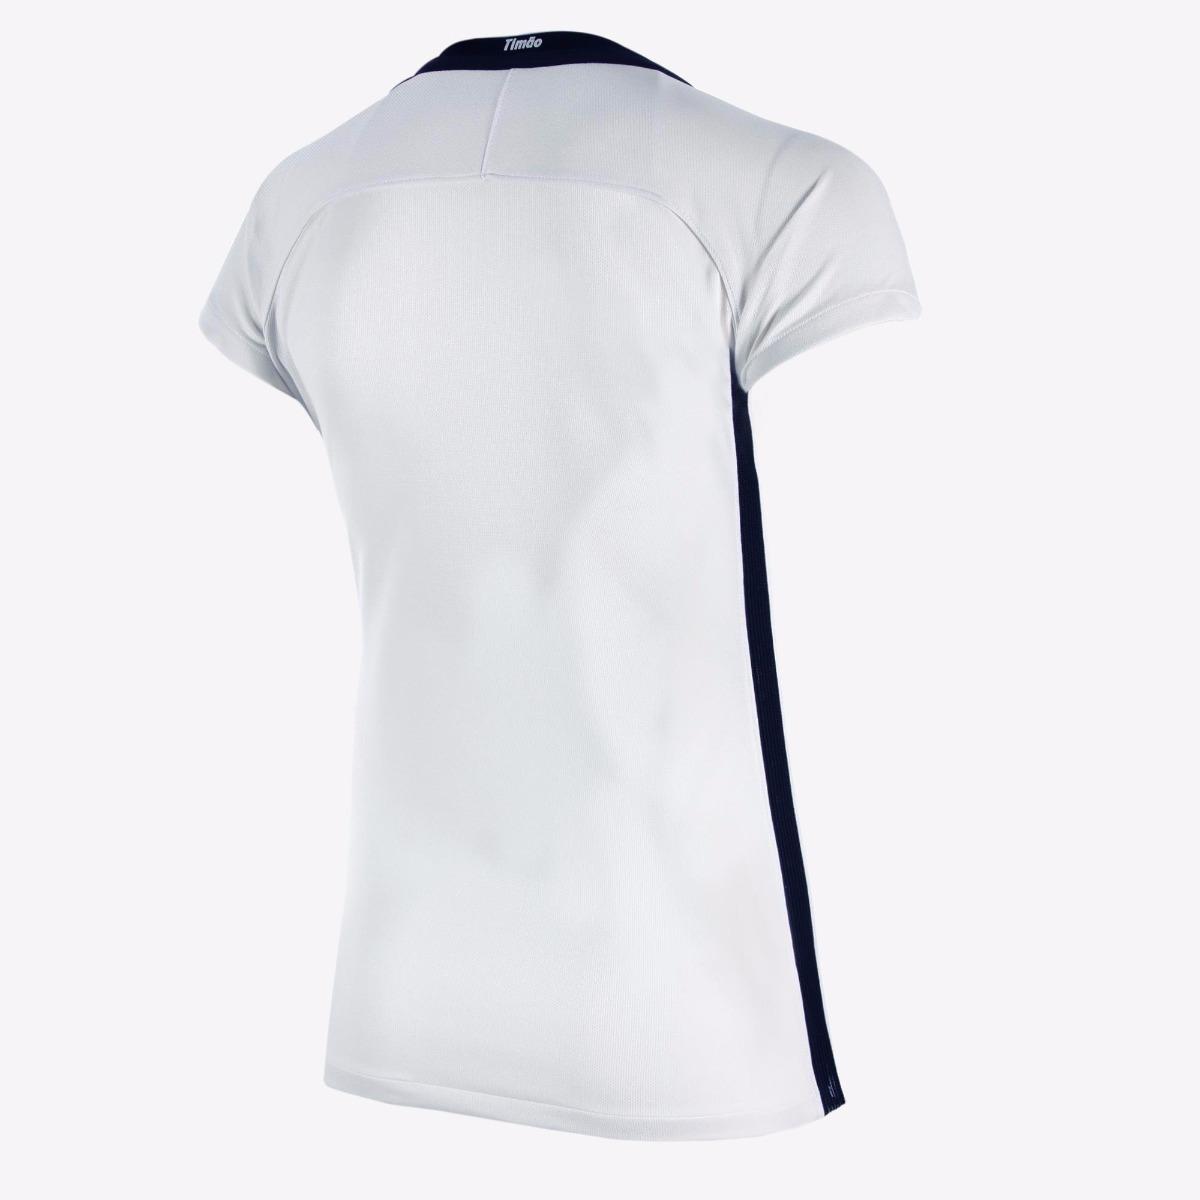 Camisa Corinthians Nike - 2016   2017 - Feminina - R  145 5d5f07090c035